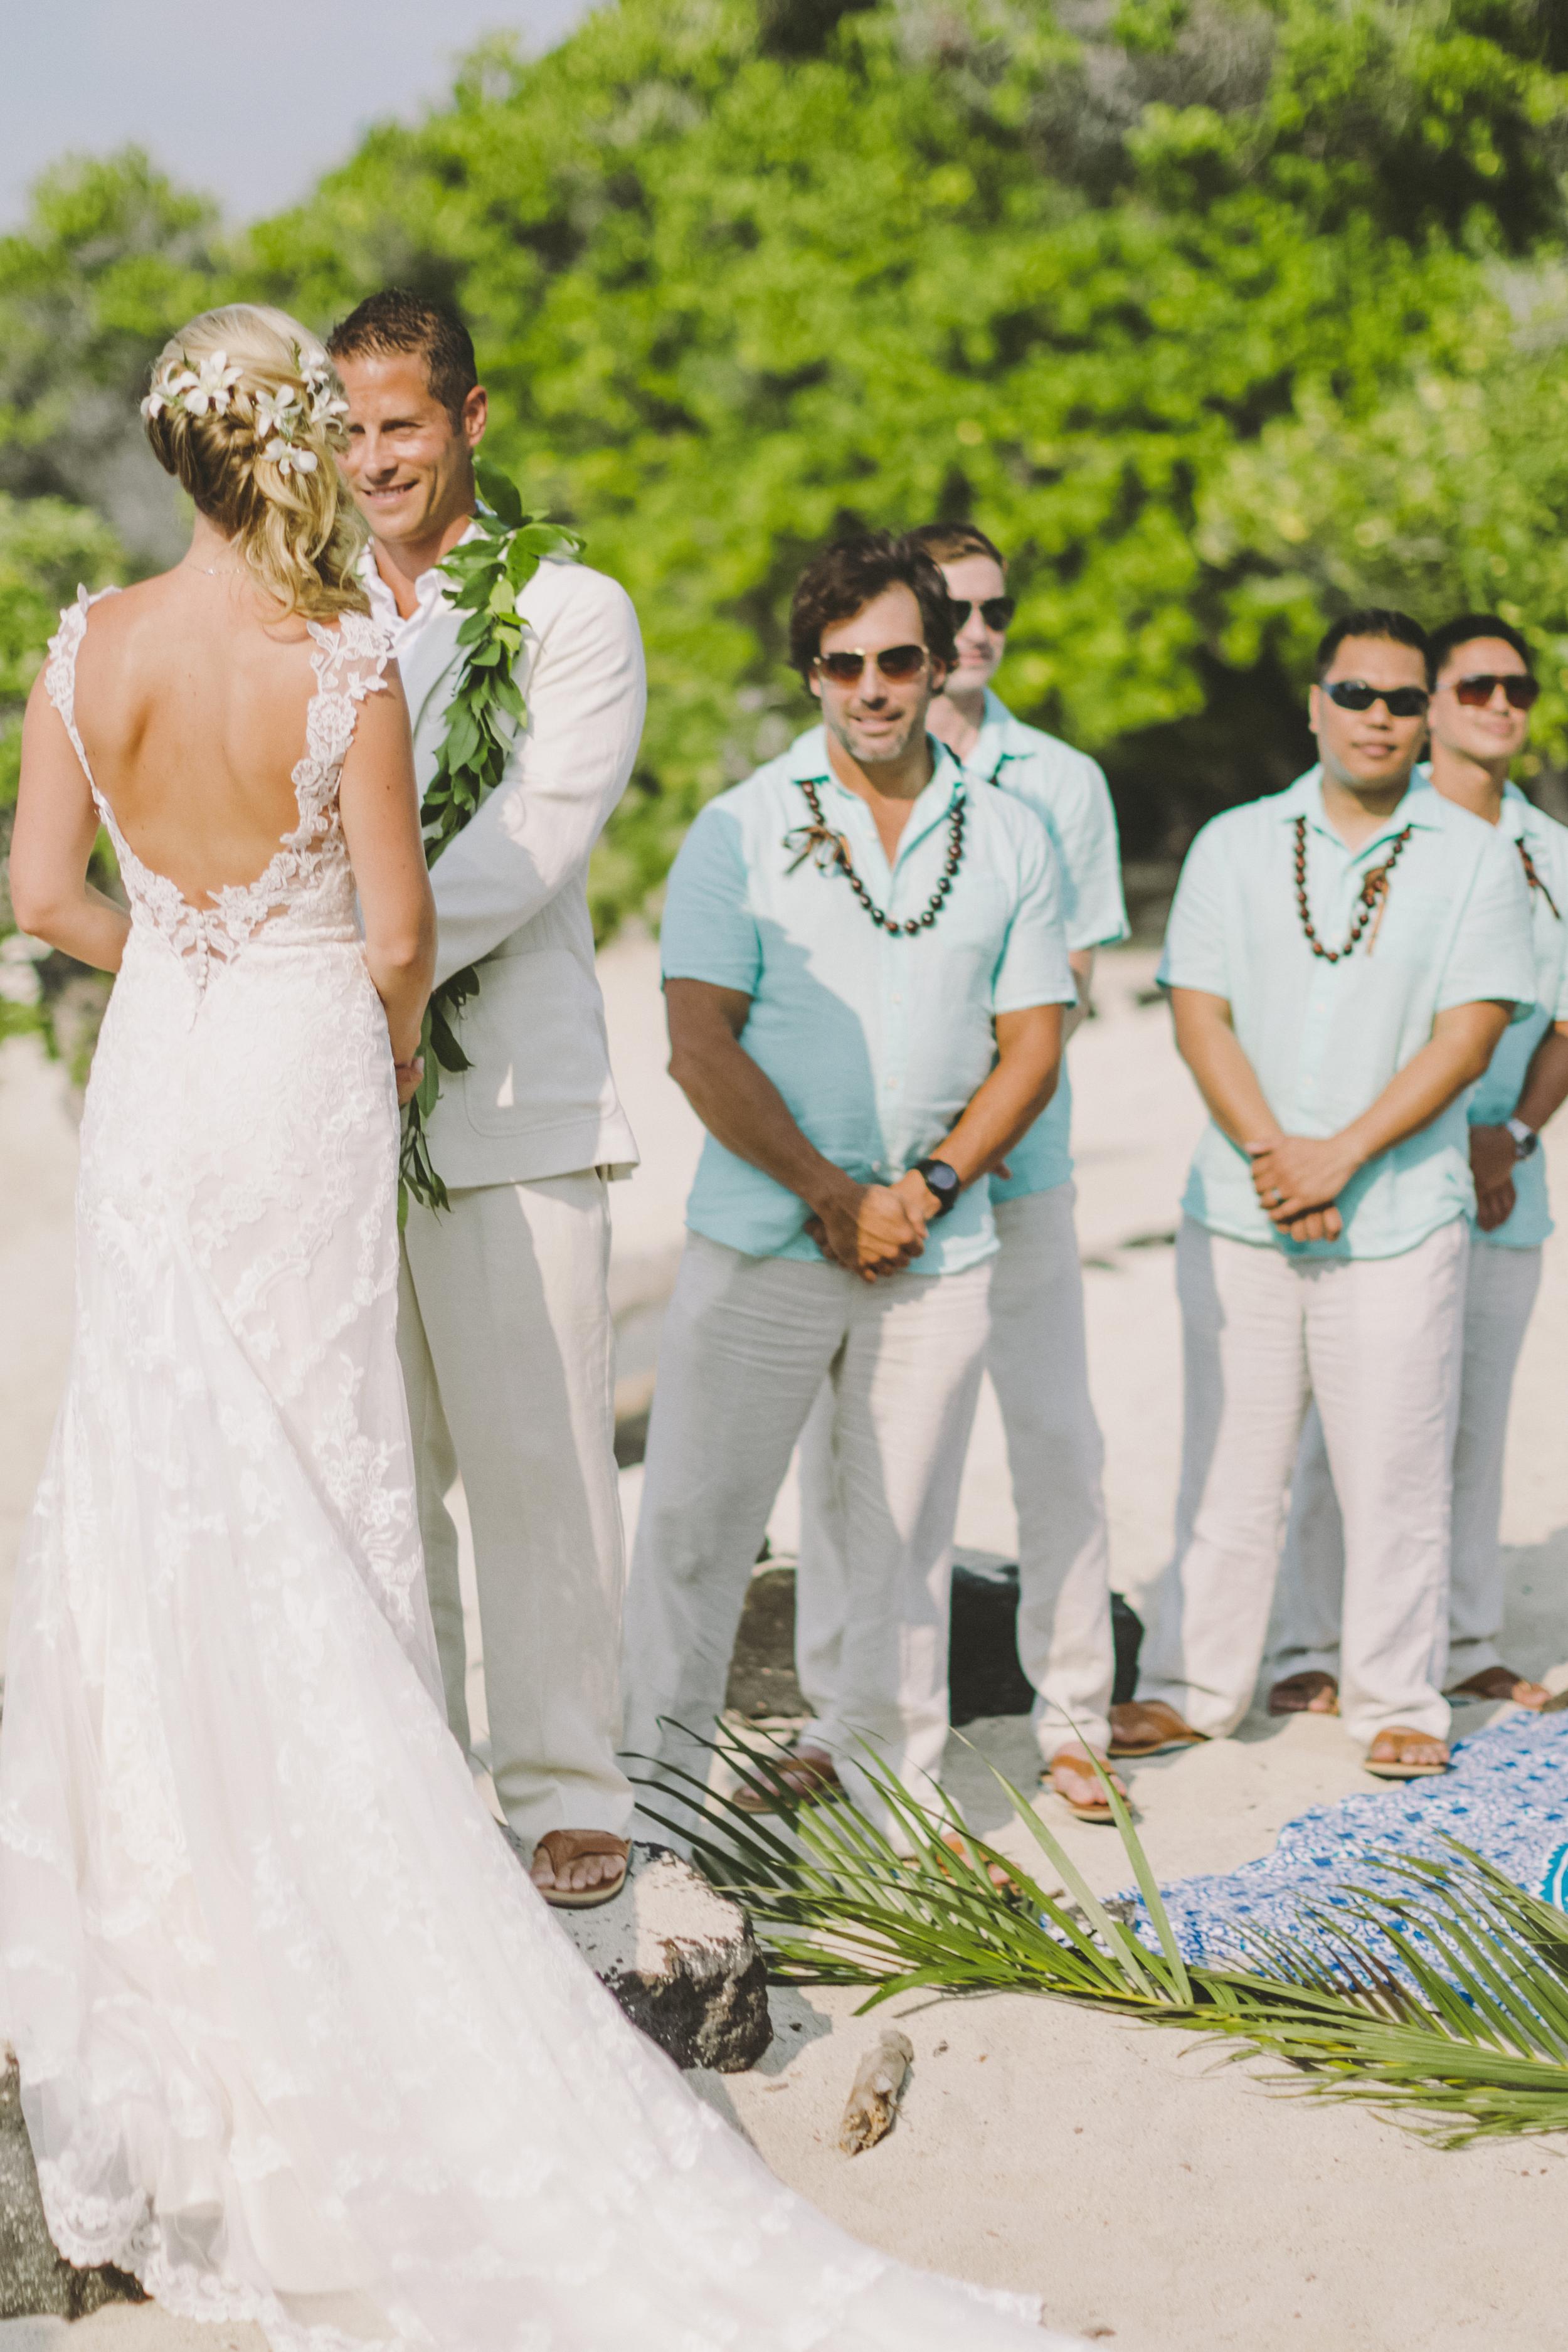 angie-diaz-photography-hawaii-wedding-photographer-kelli-jay-68.jpg